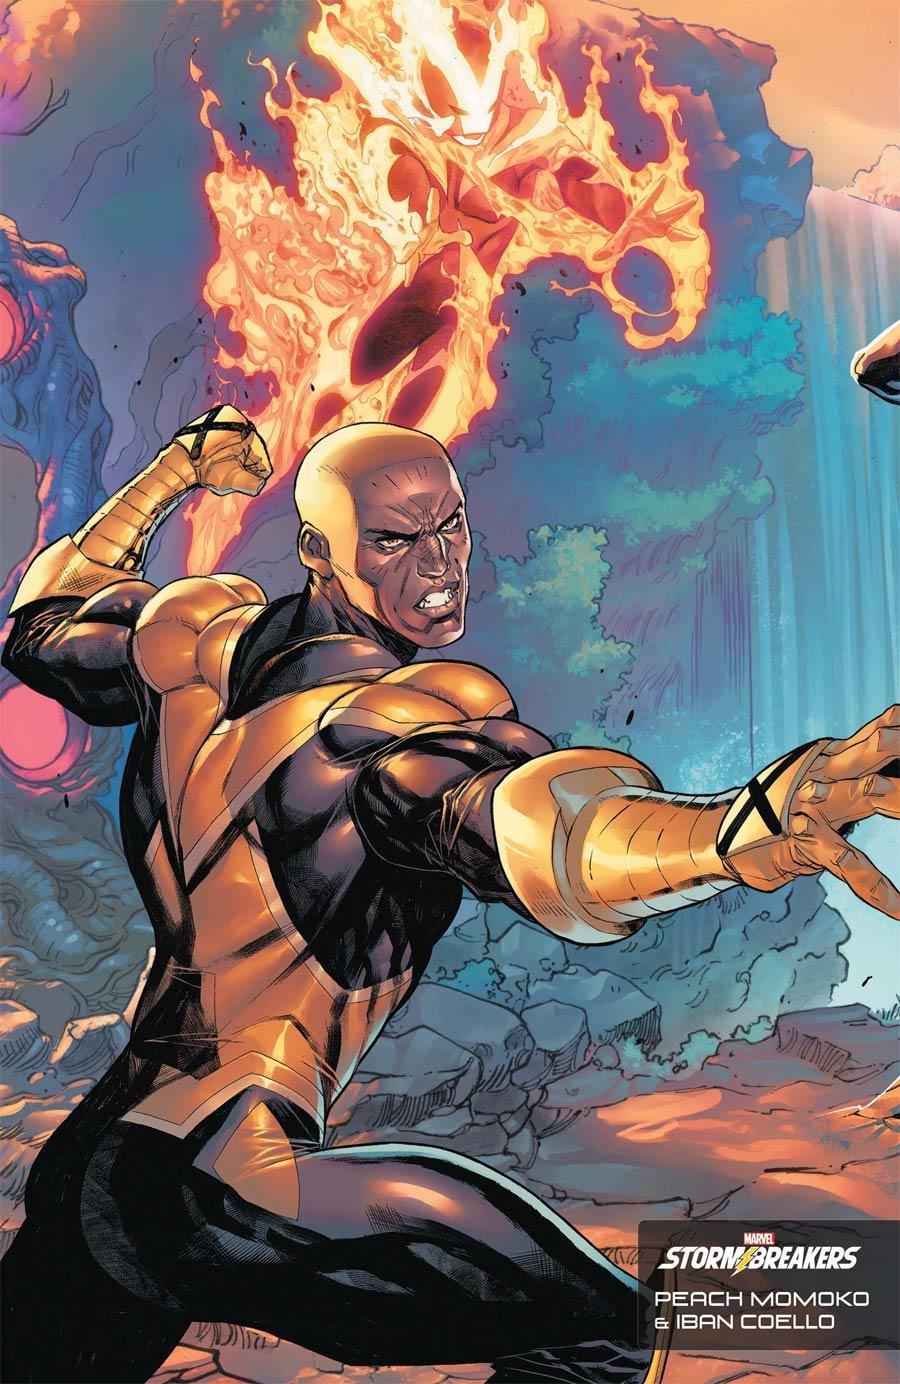 X-Men Vol 6 #1 Cover G Variant Peach Momoko & Iban Coello Stormbreakers Cover